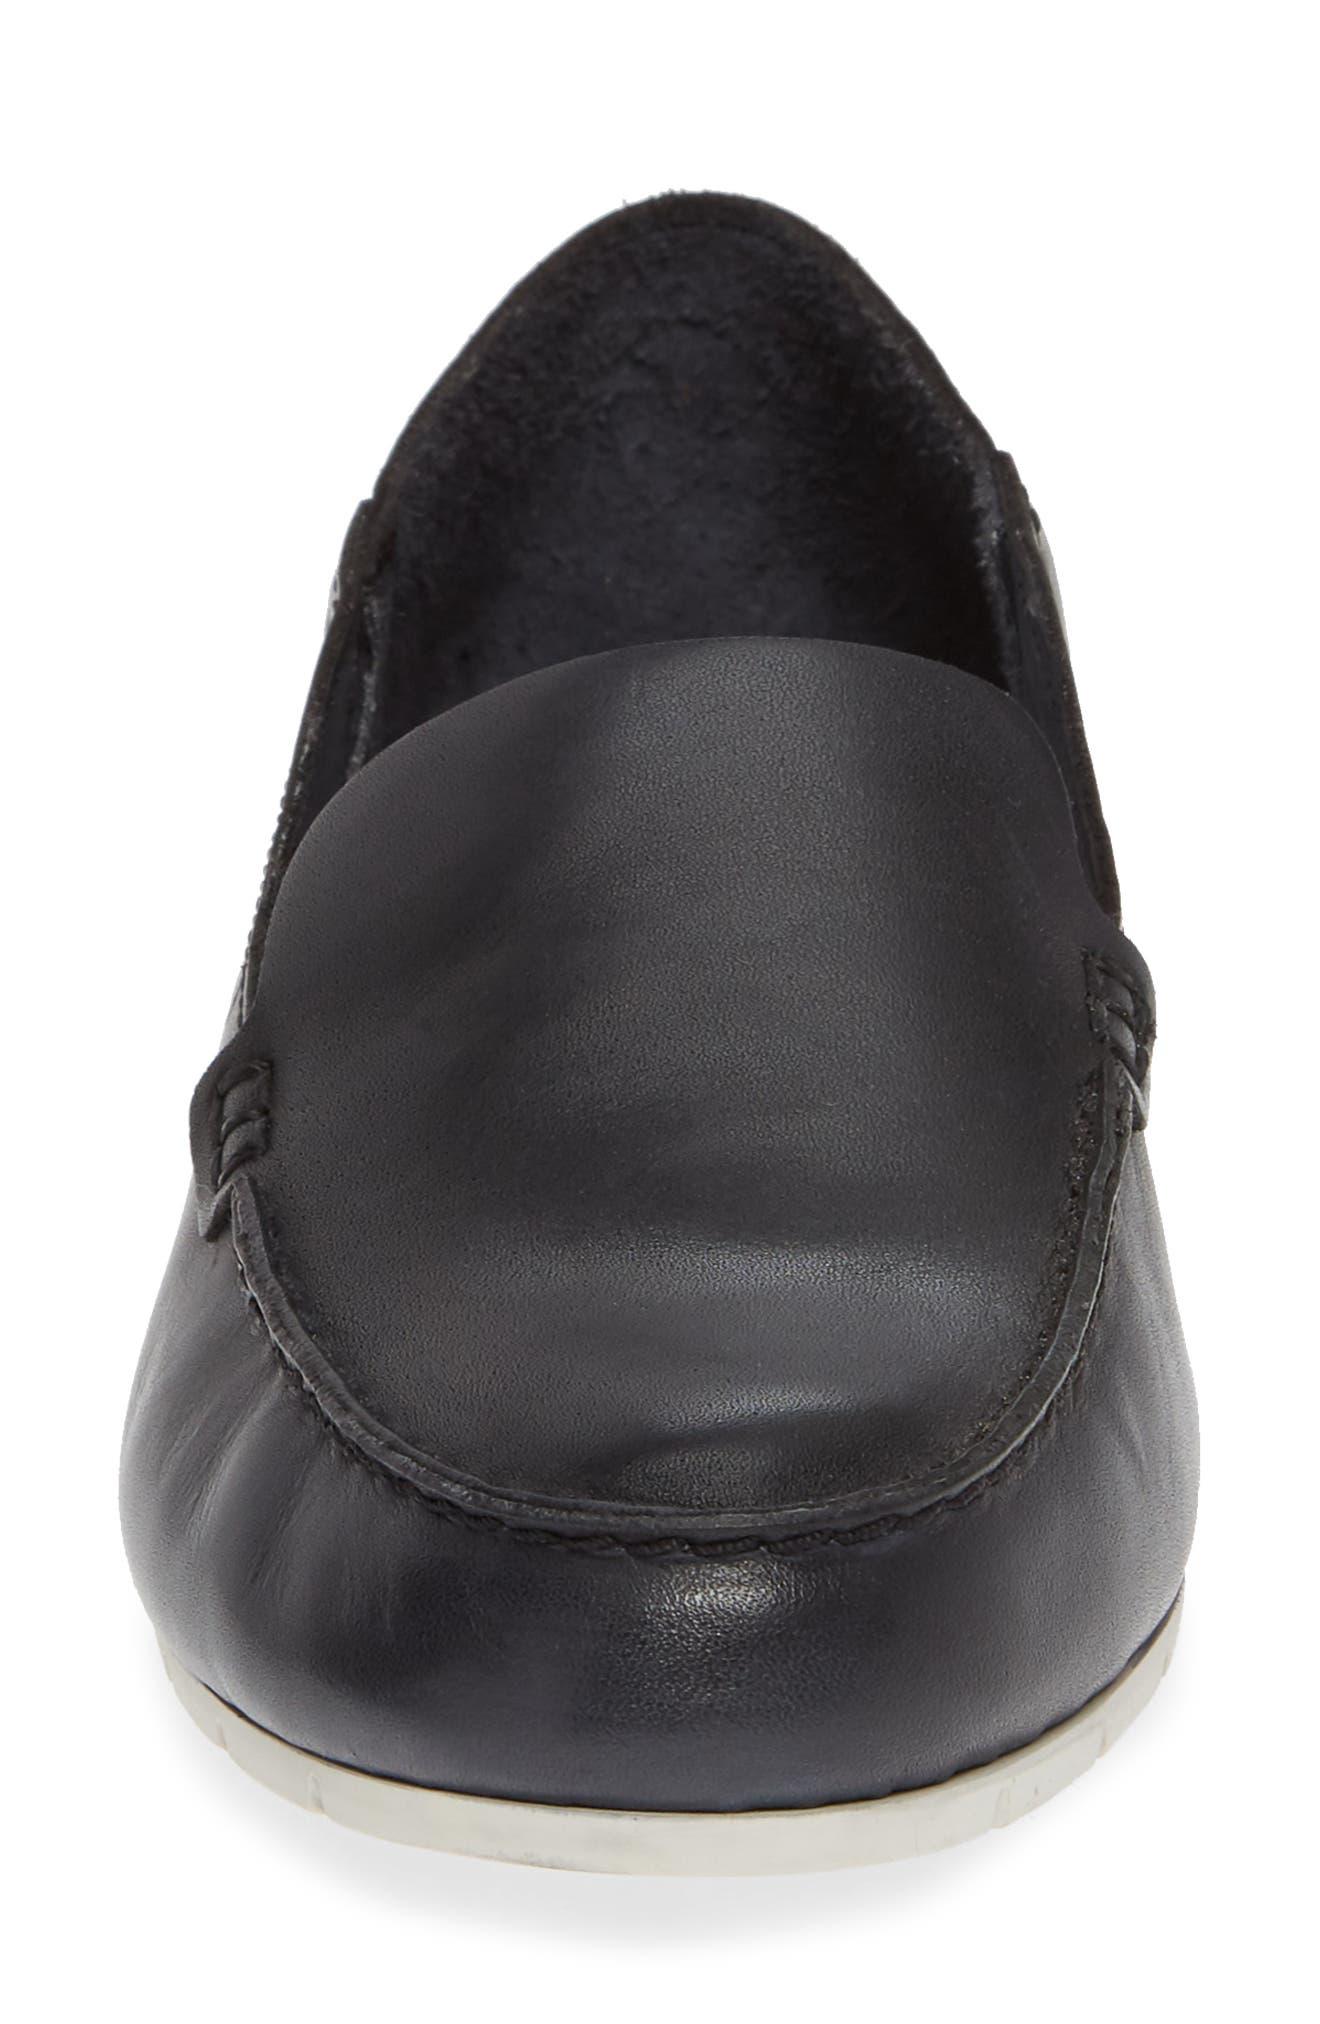 Sedona Venetian Loafer,                             Alternate thumbnail 4, color,                             BLACK LEATHER